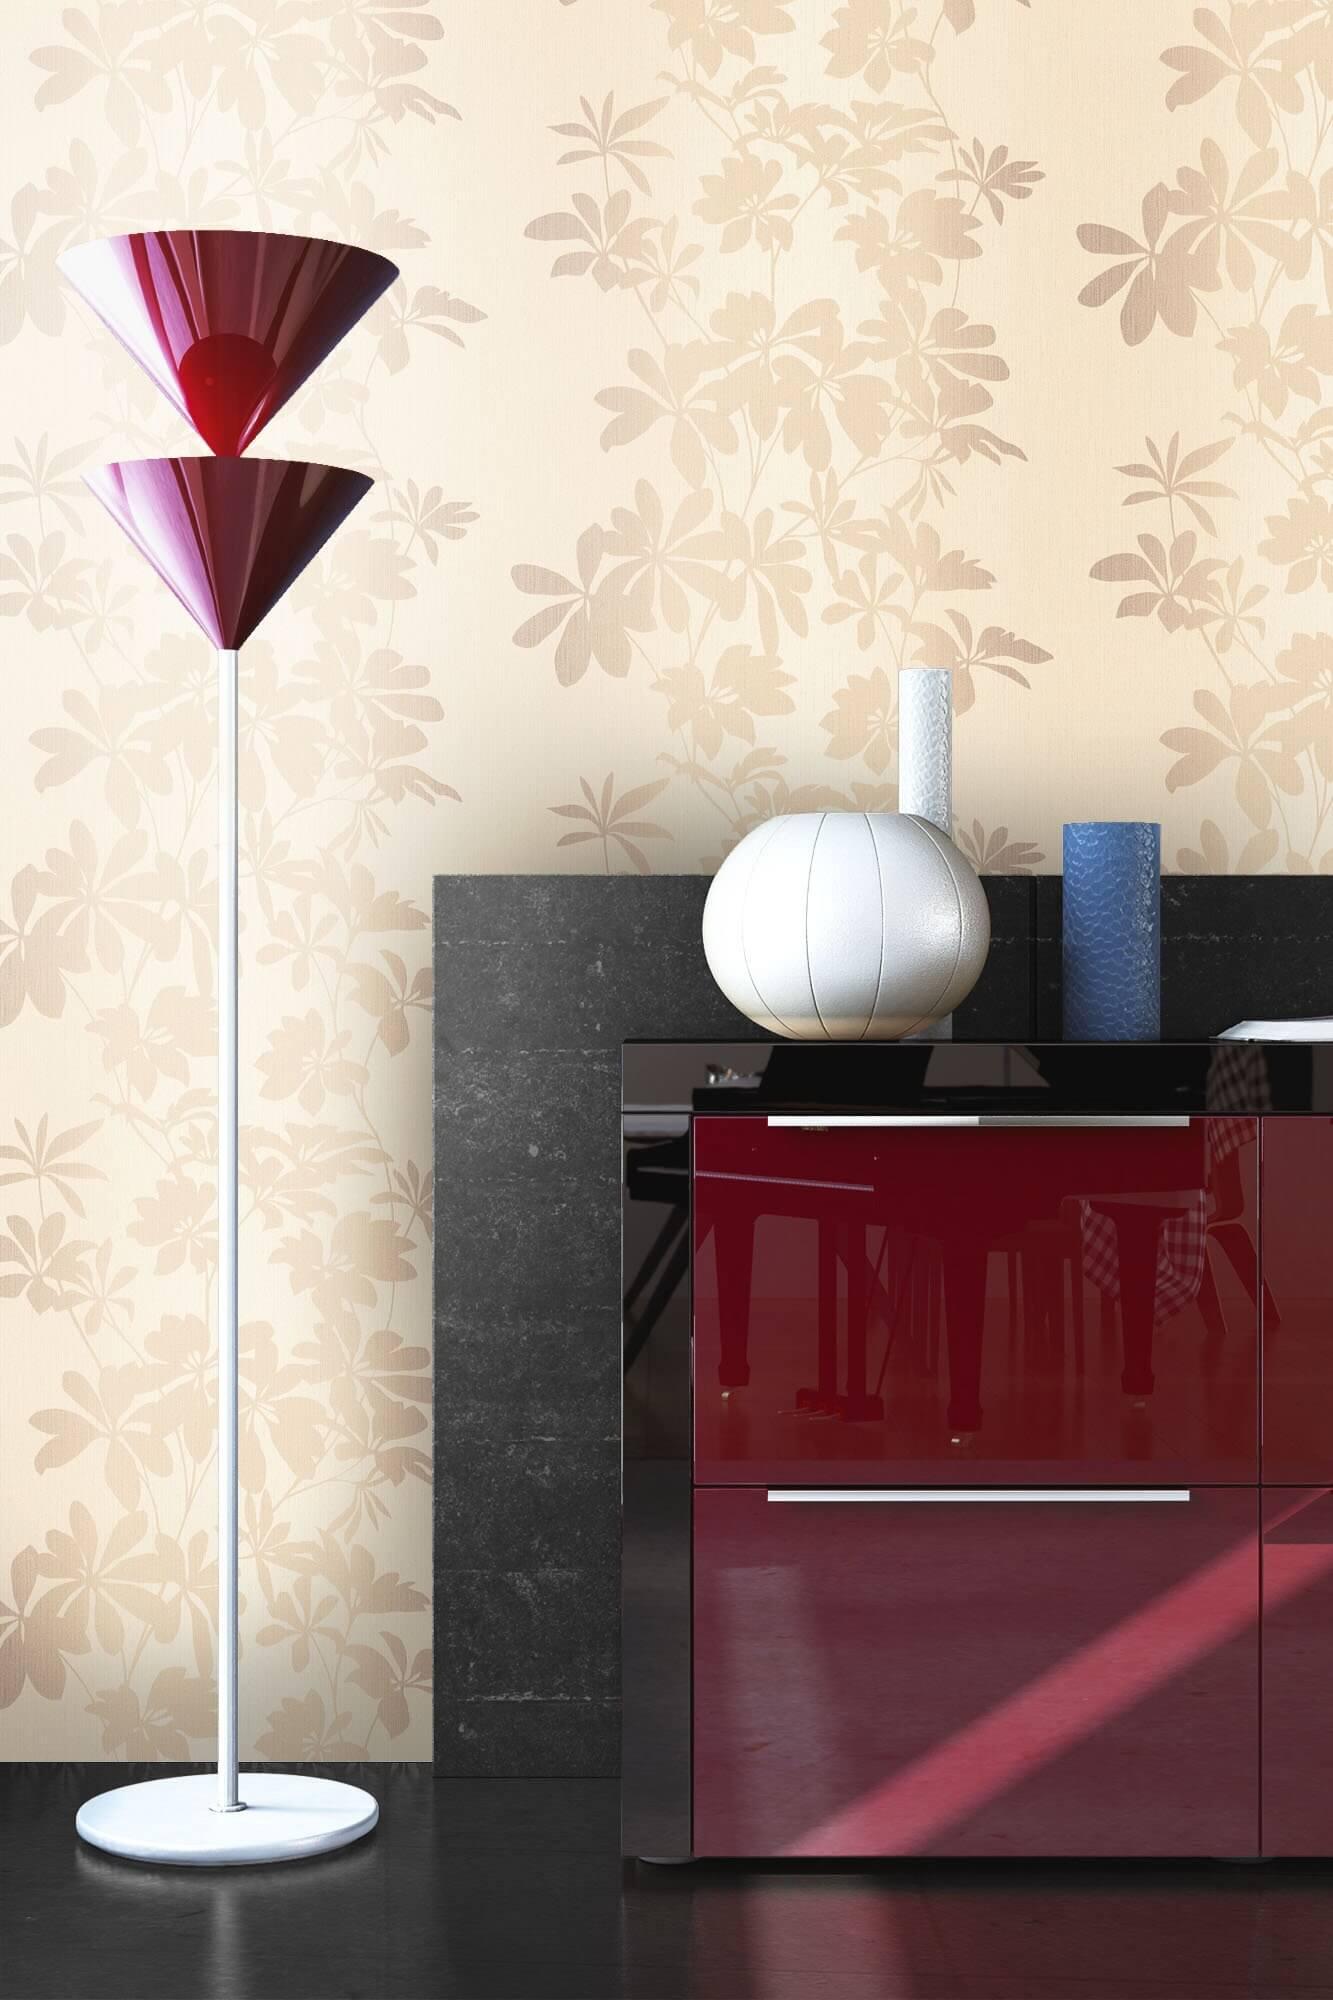 vliestapete beige floral diele flur schlafen. Black Bedroom Furniture Sets. Home Design Ideas